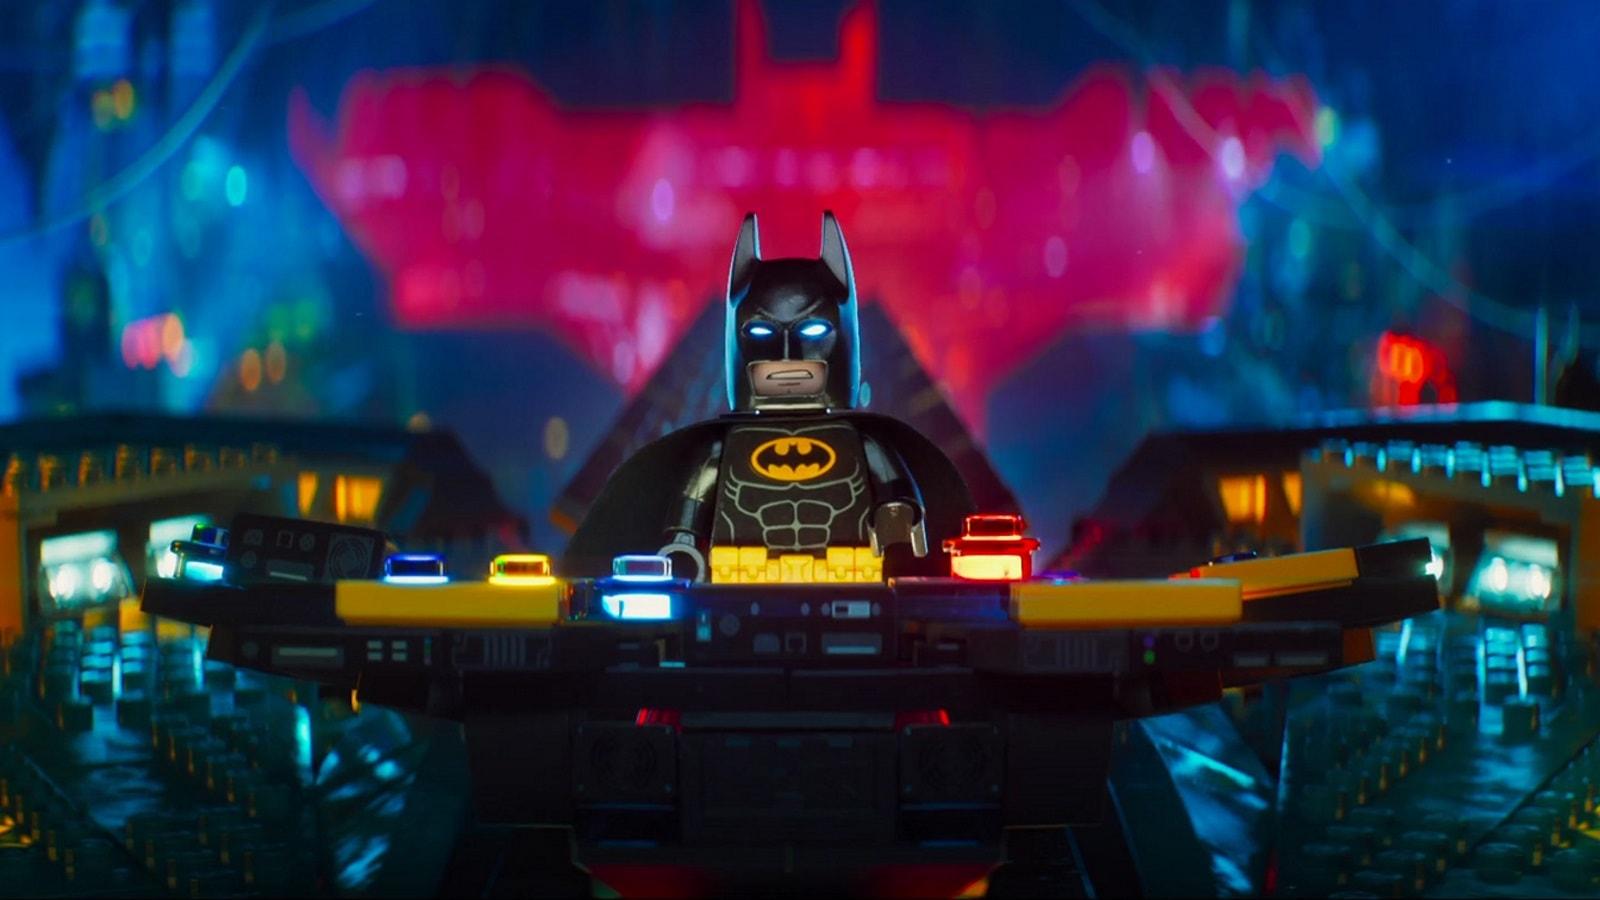 The Lego Batman Movie Wallpaper Hd - Lego Batman Movie Puter , HD Wallpaper & Backgrounds